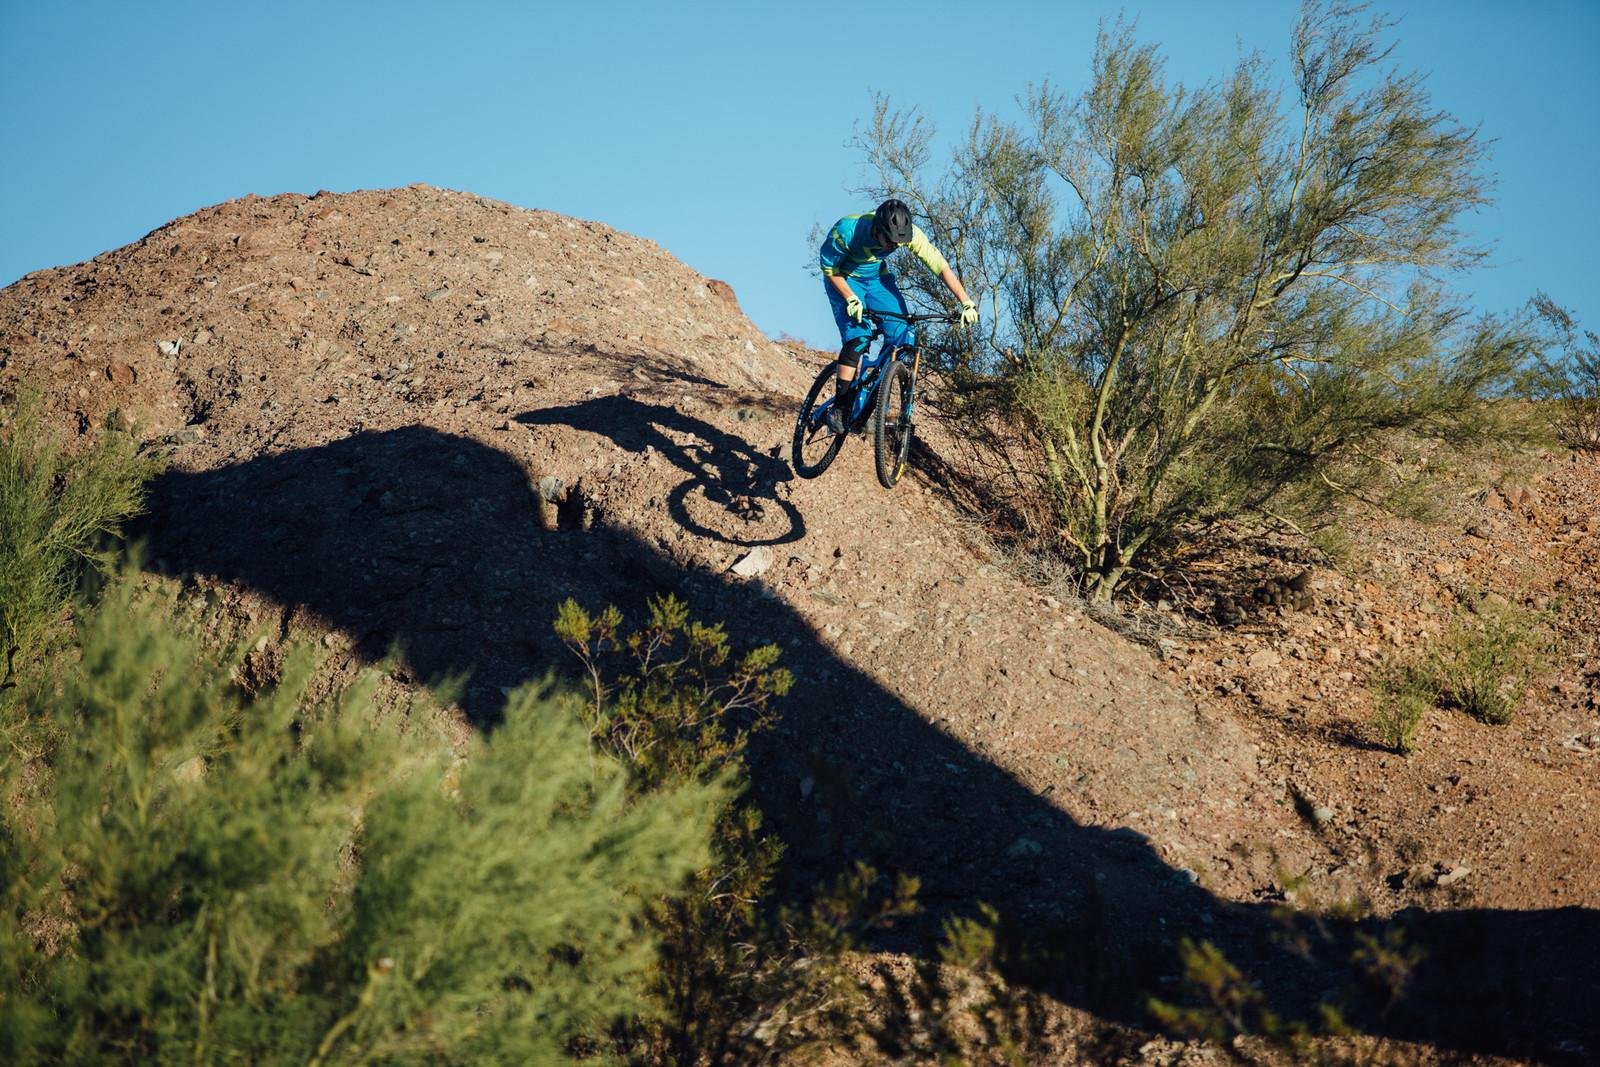 Pivot Mach 429 Trail - 2016 Vital MTB Test Sessions - Pivot Mach 429 Trail Carbon XTR/XT Pro 1X - 2016 Vital MTB Test Sessions - Mountain Biking Pictures - Vital MTB